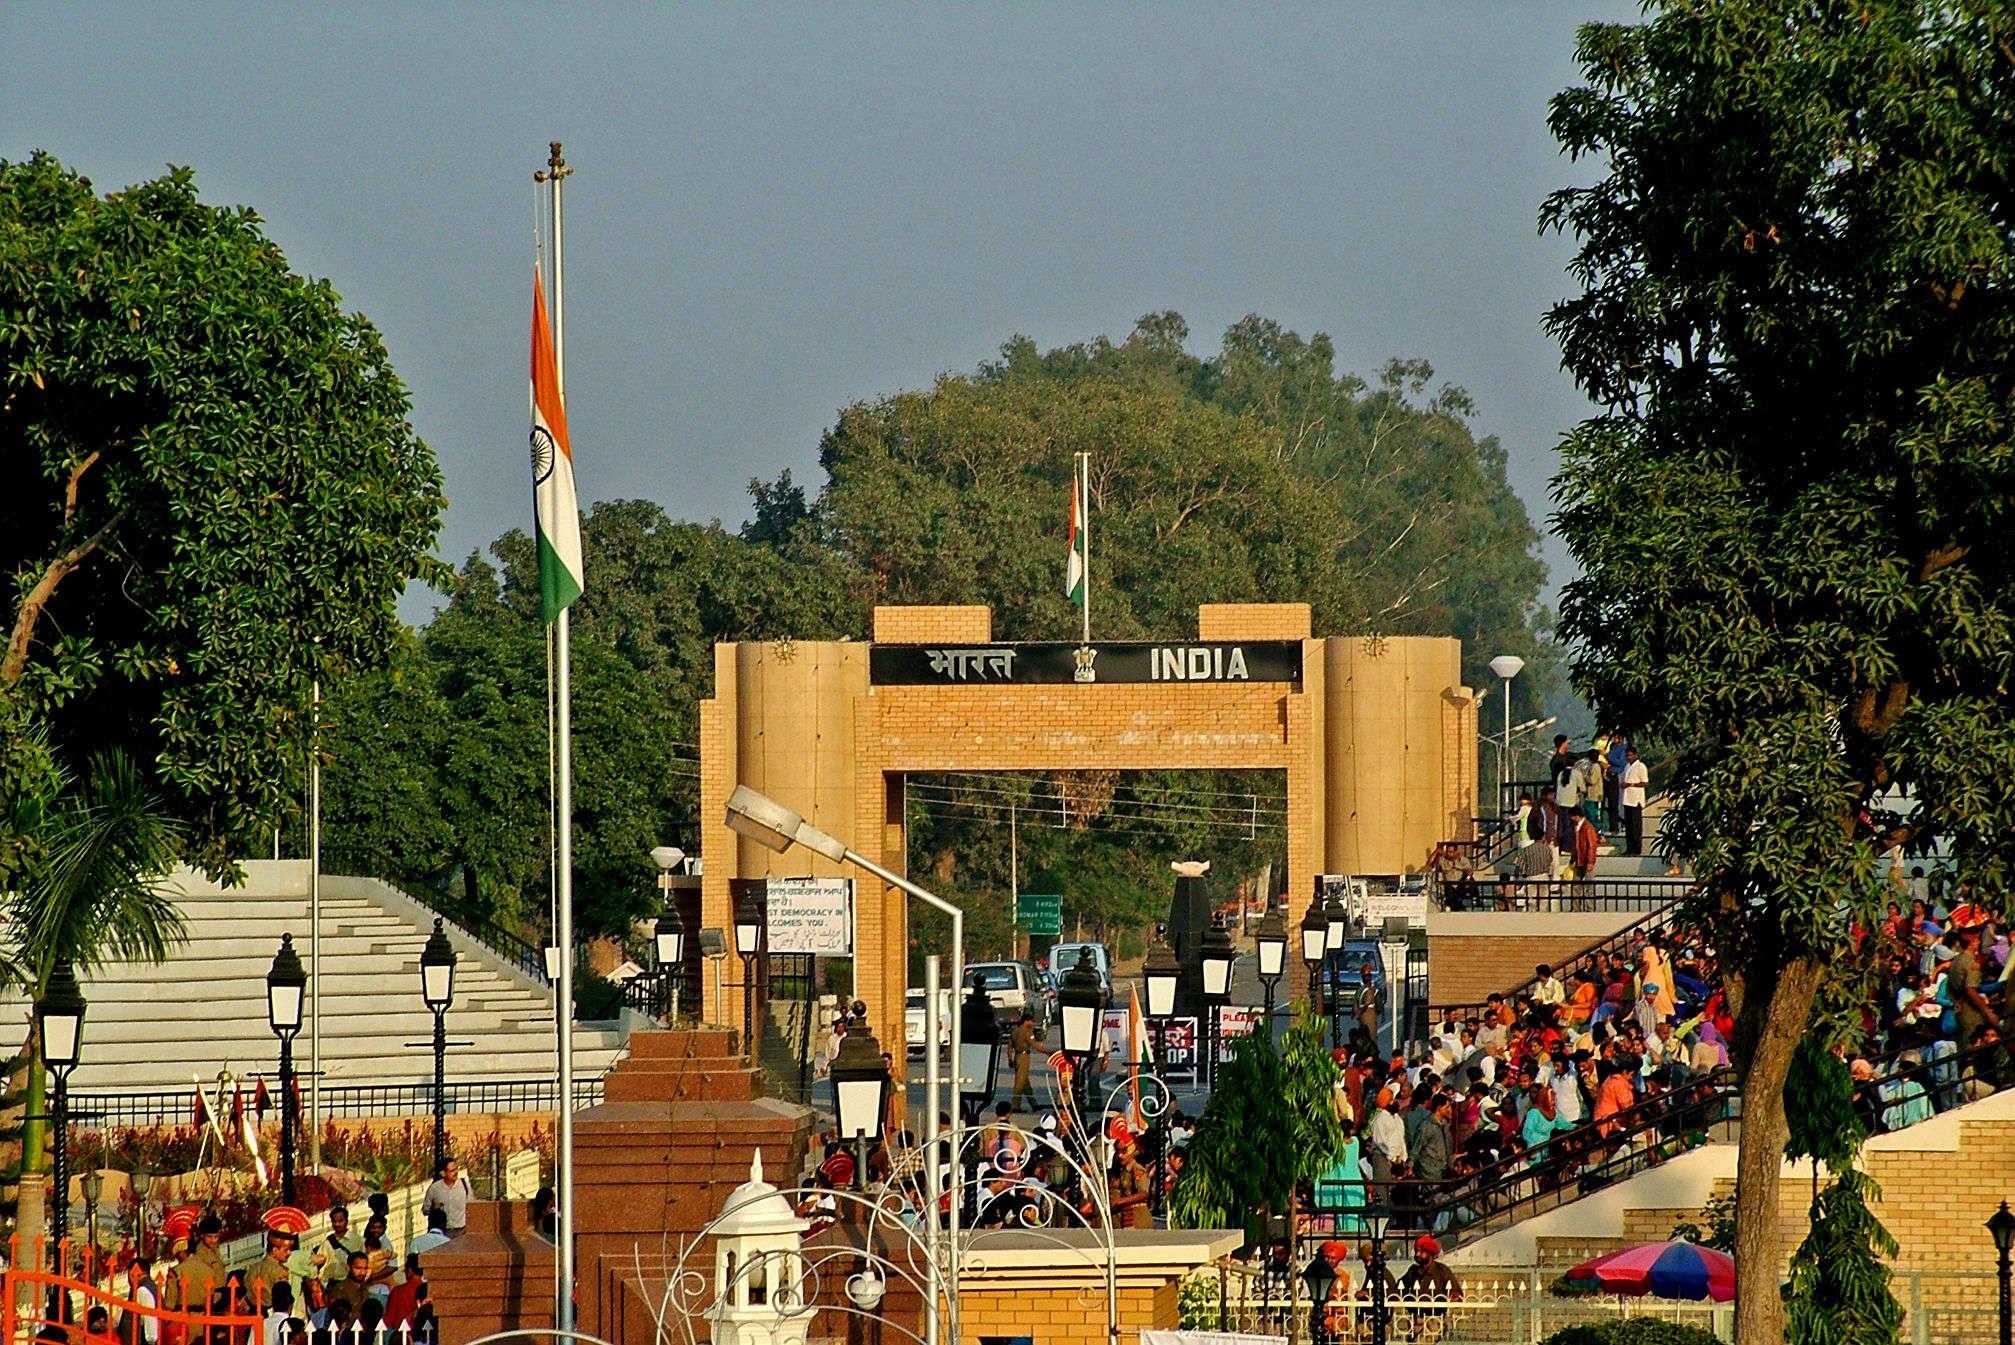 Five international borders in India